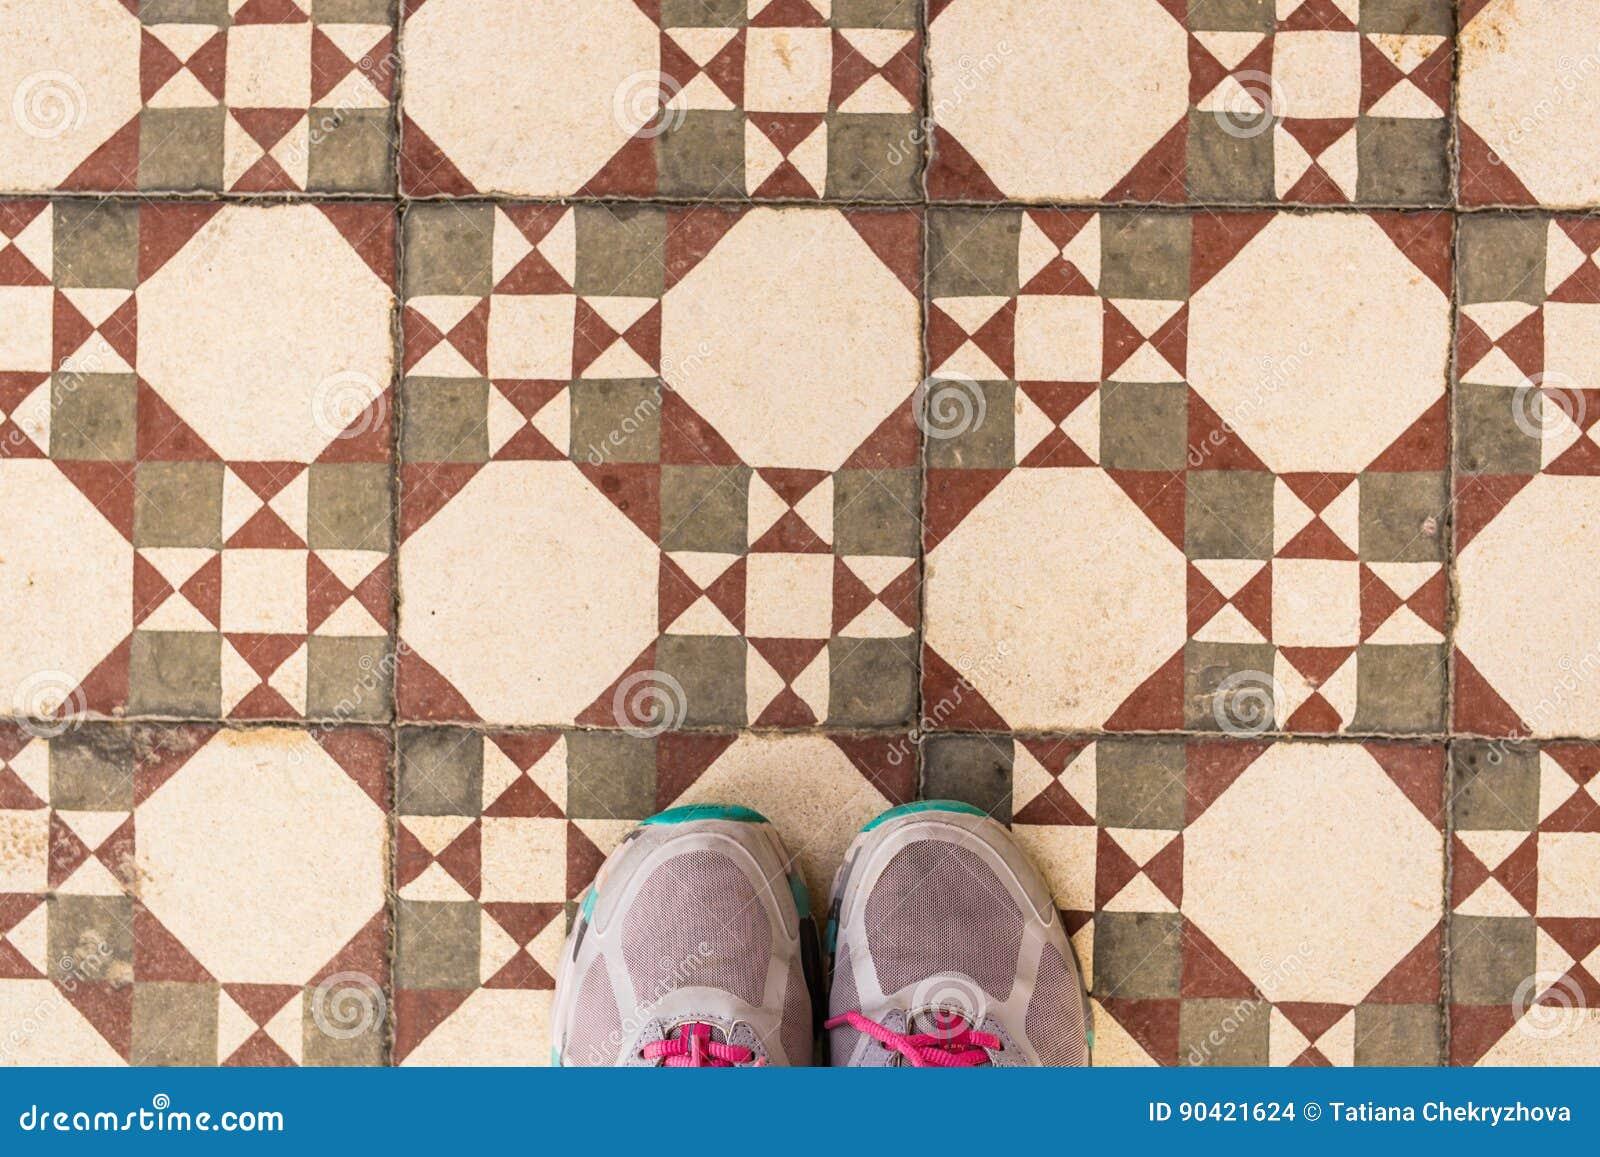 Selfie Of Feet With Sneaker Shoes On Art Pattern Tiles Floor Top View